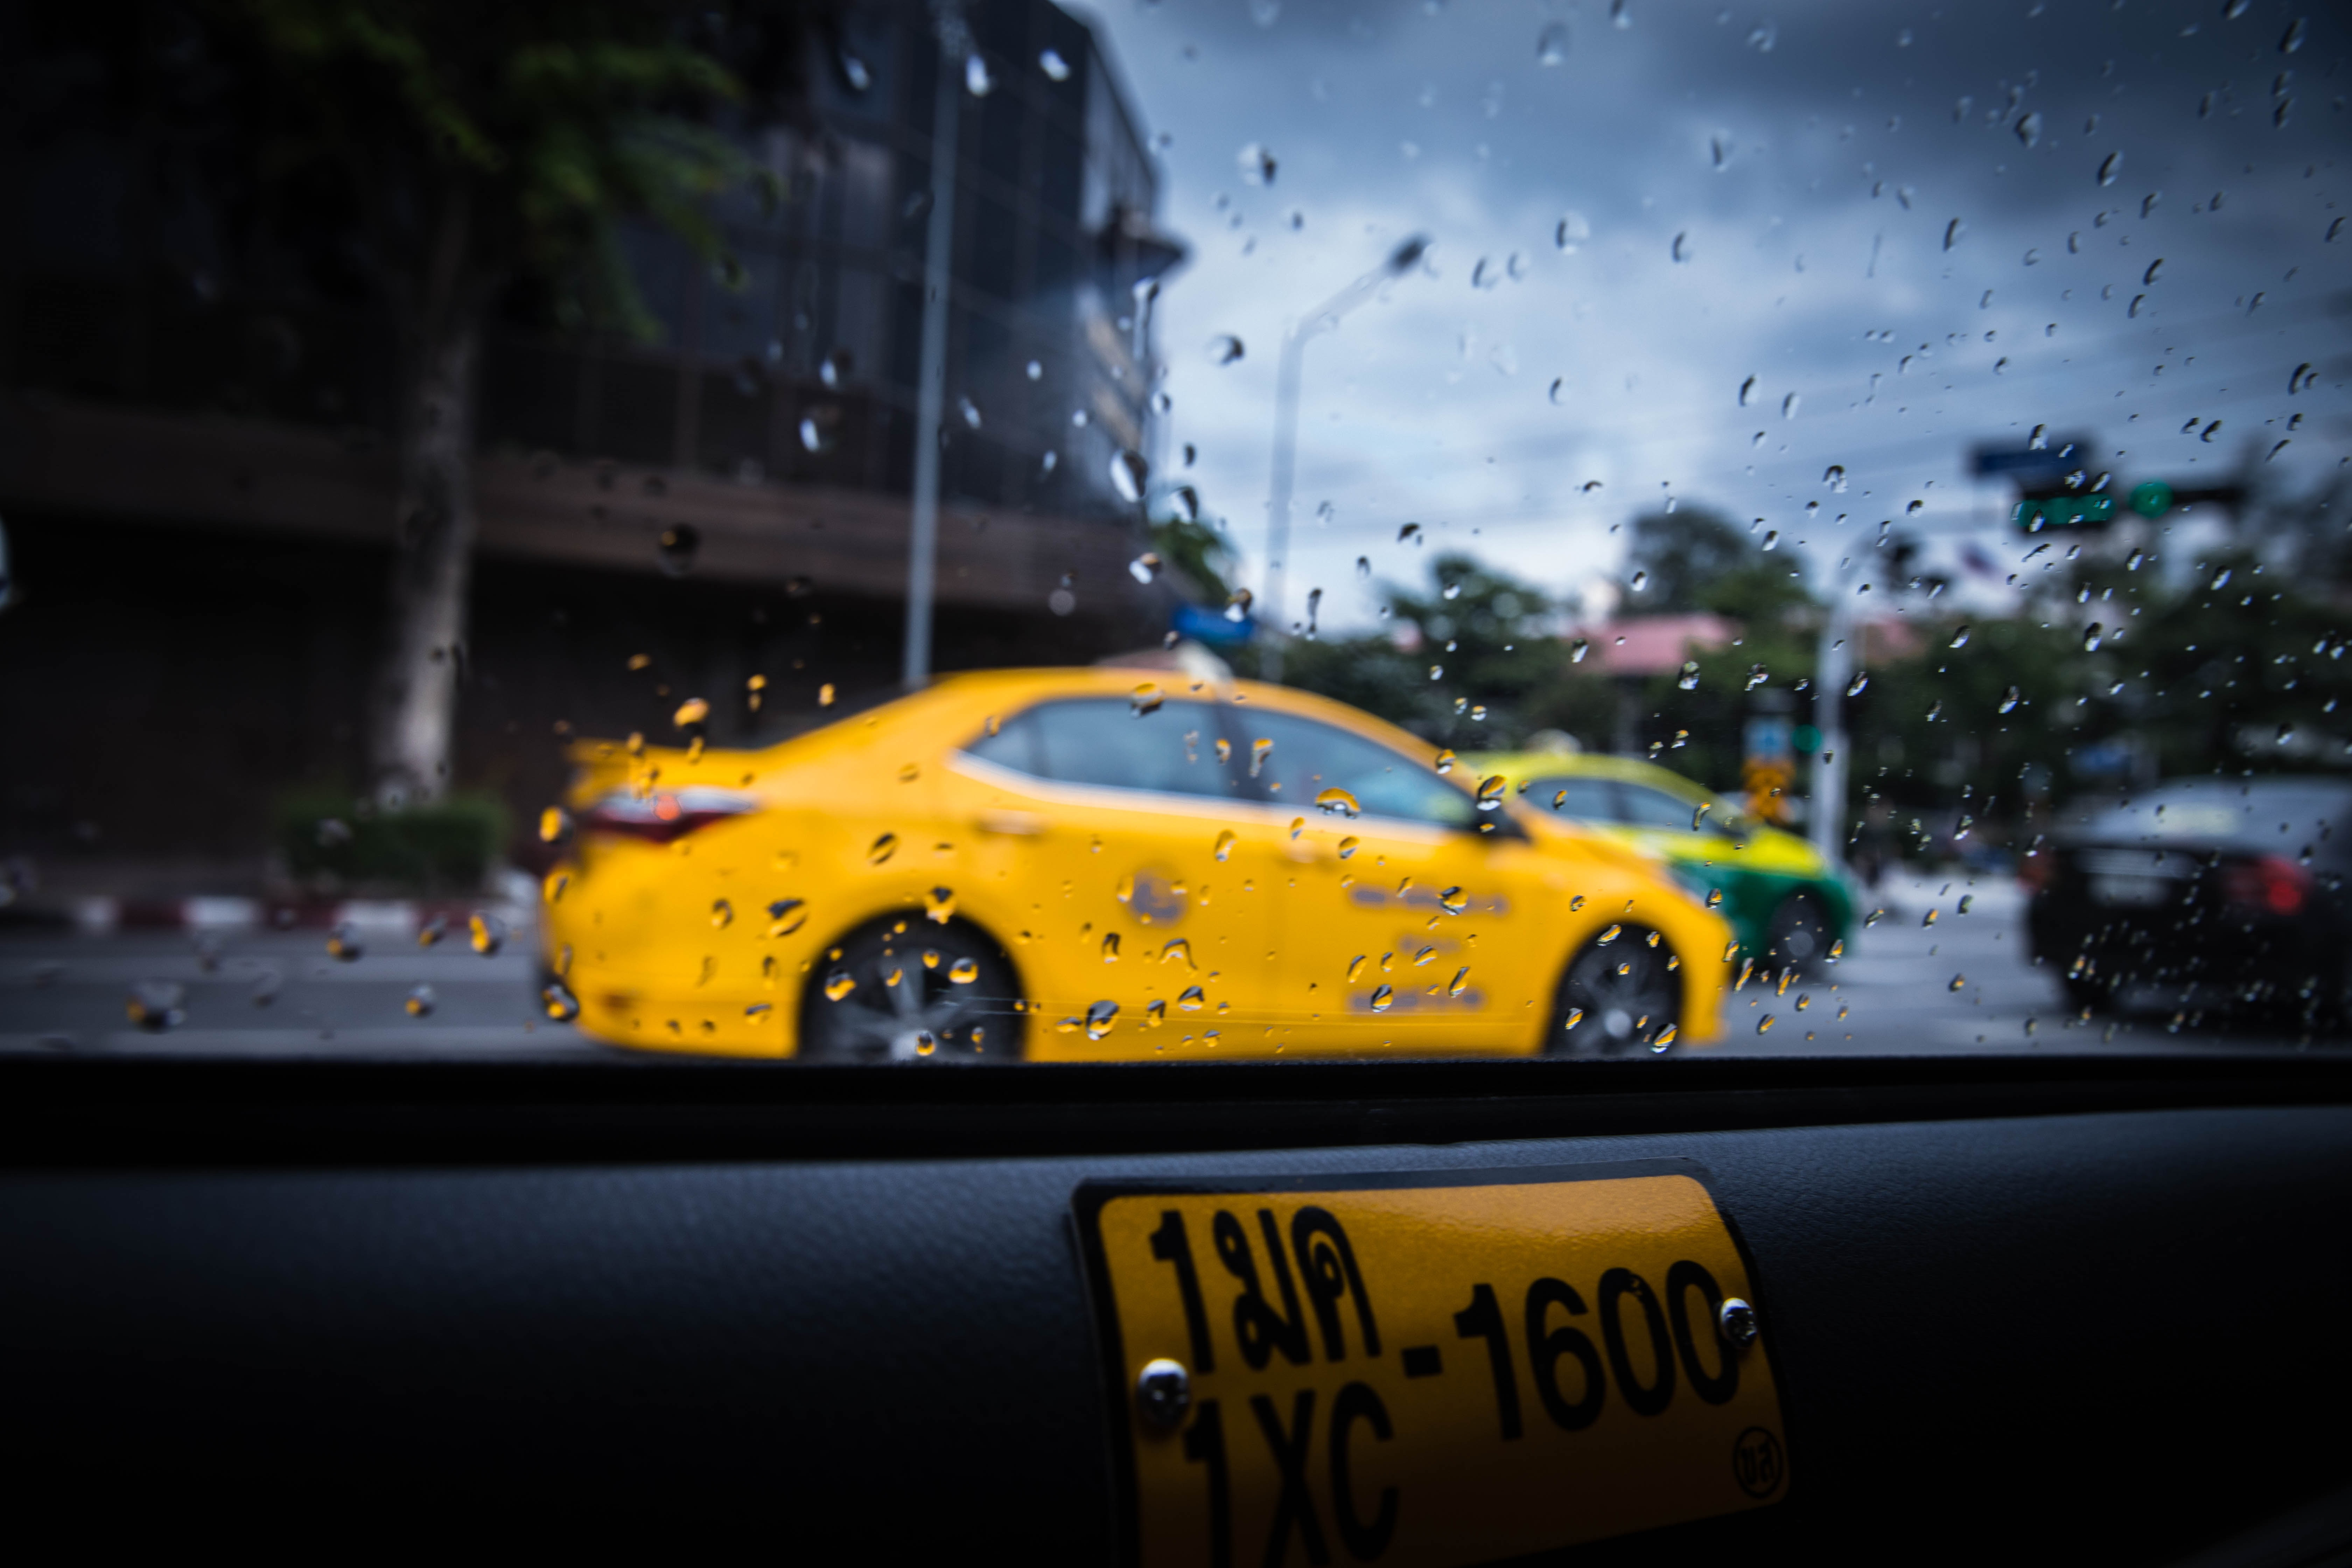 про такси в январе 2019